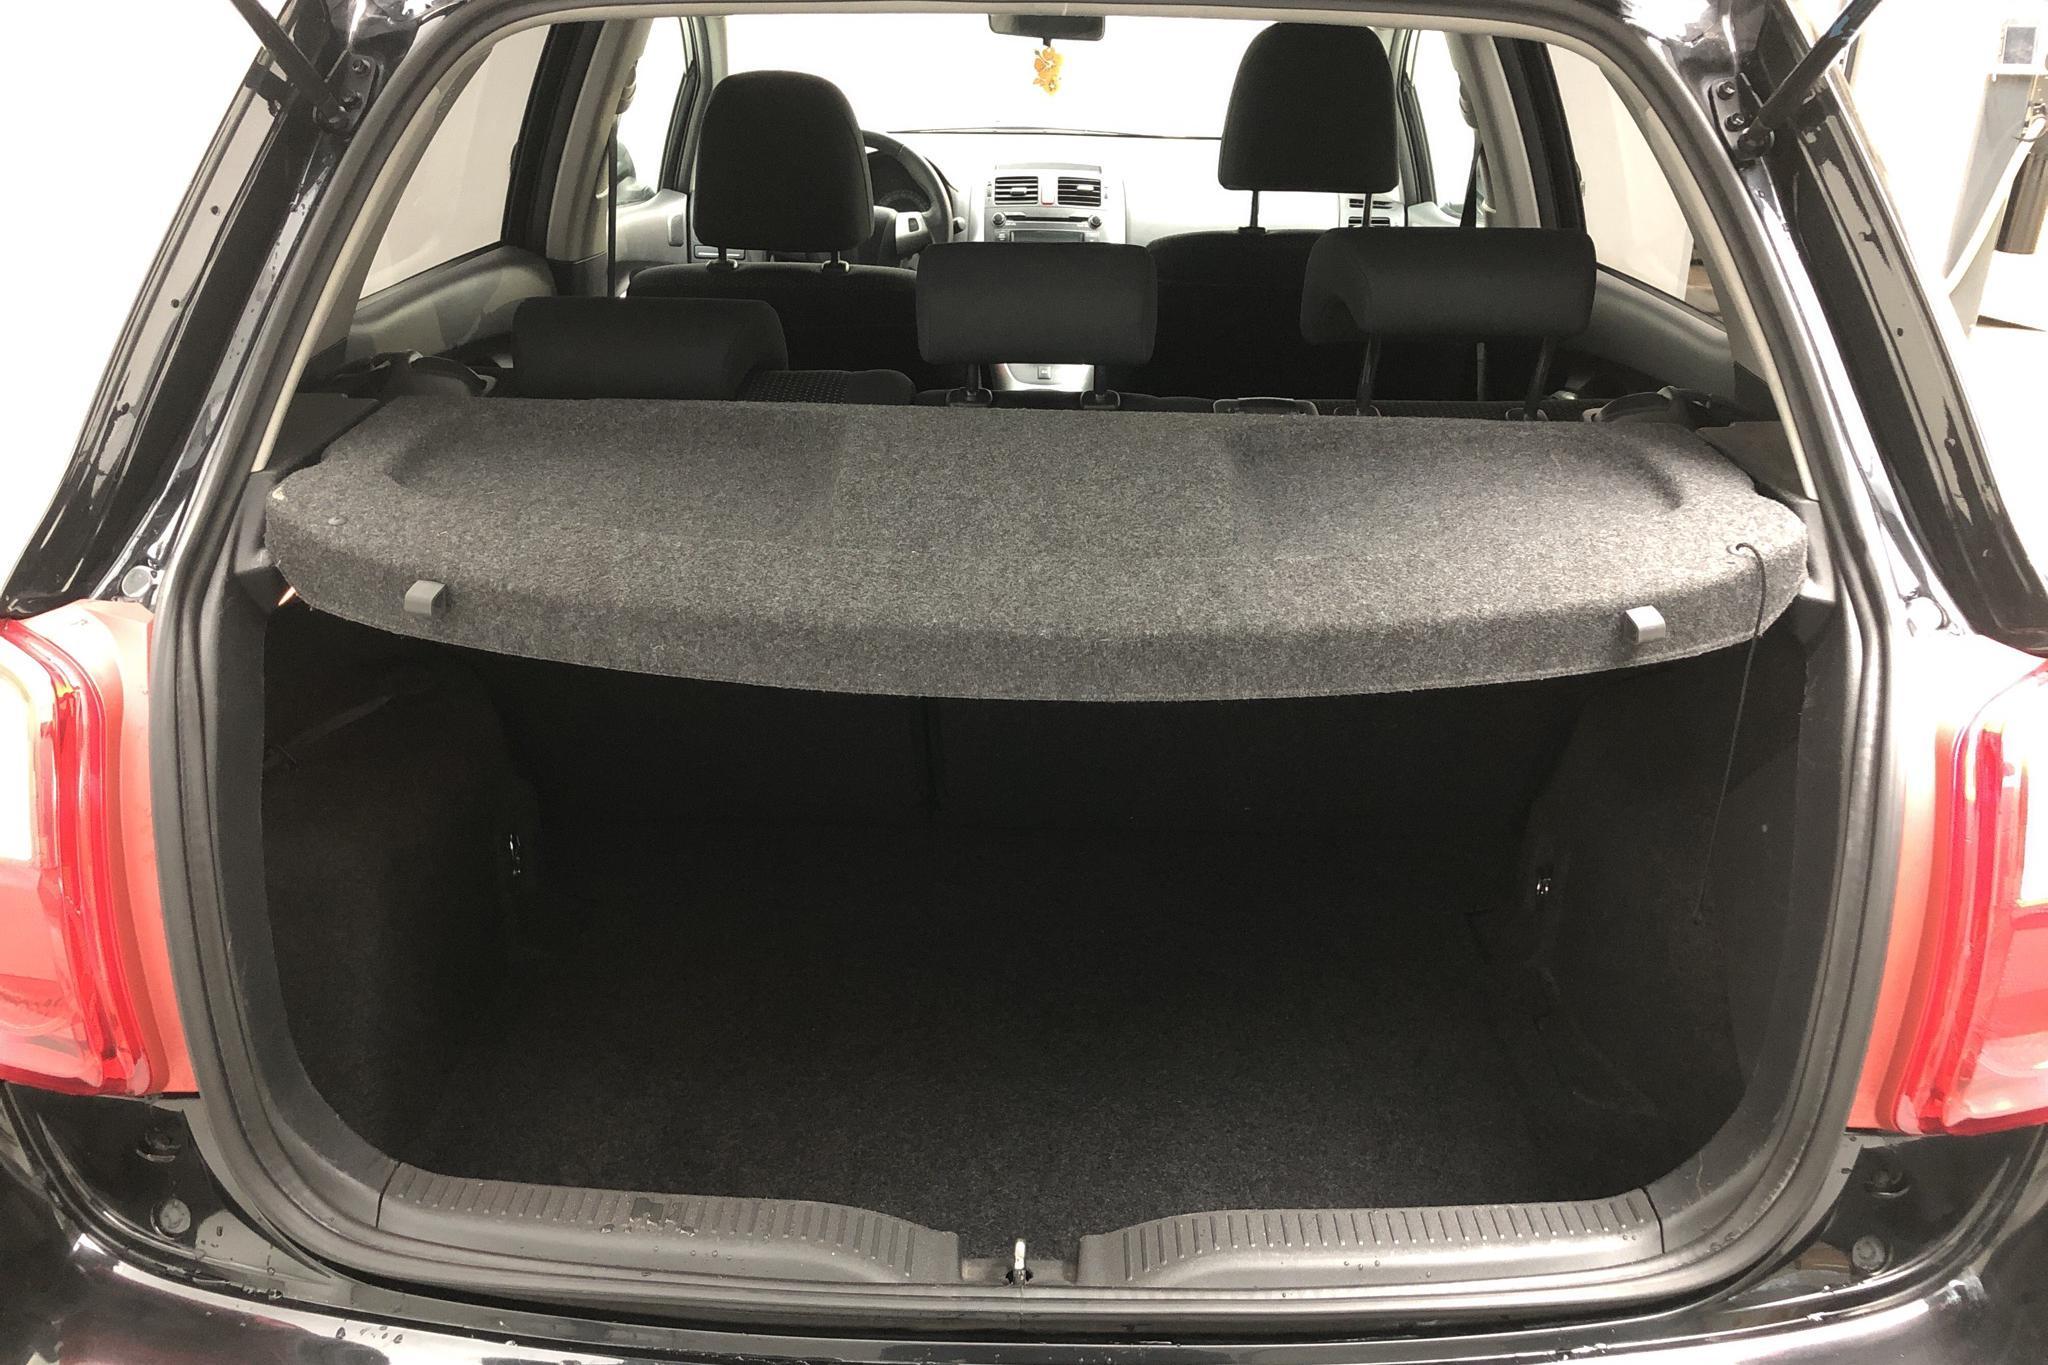 Toyota Auris 1.6 VVT-i 5dr (132hk) - 10 091 mil - Automat - svart - 2012